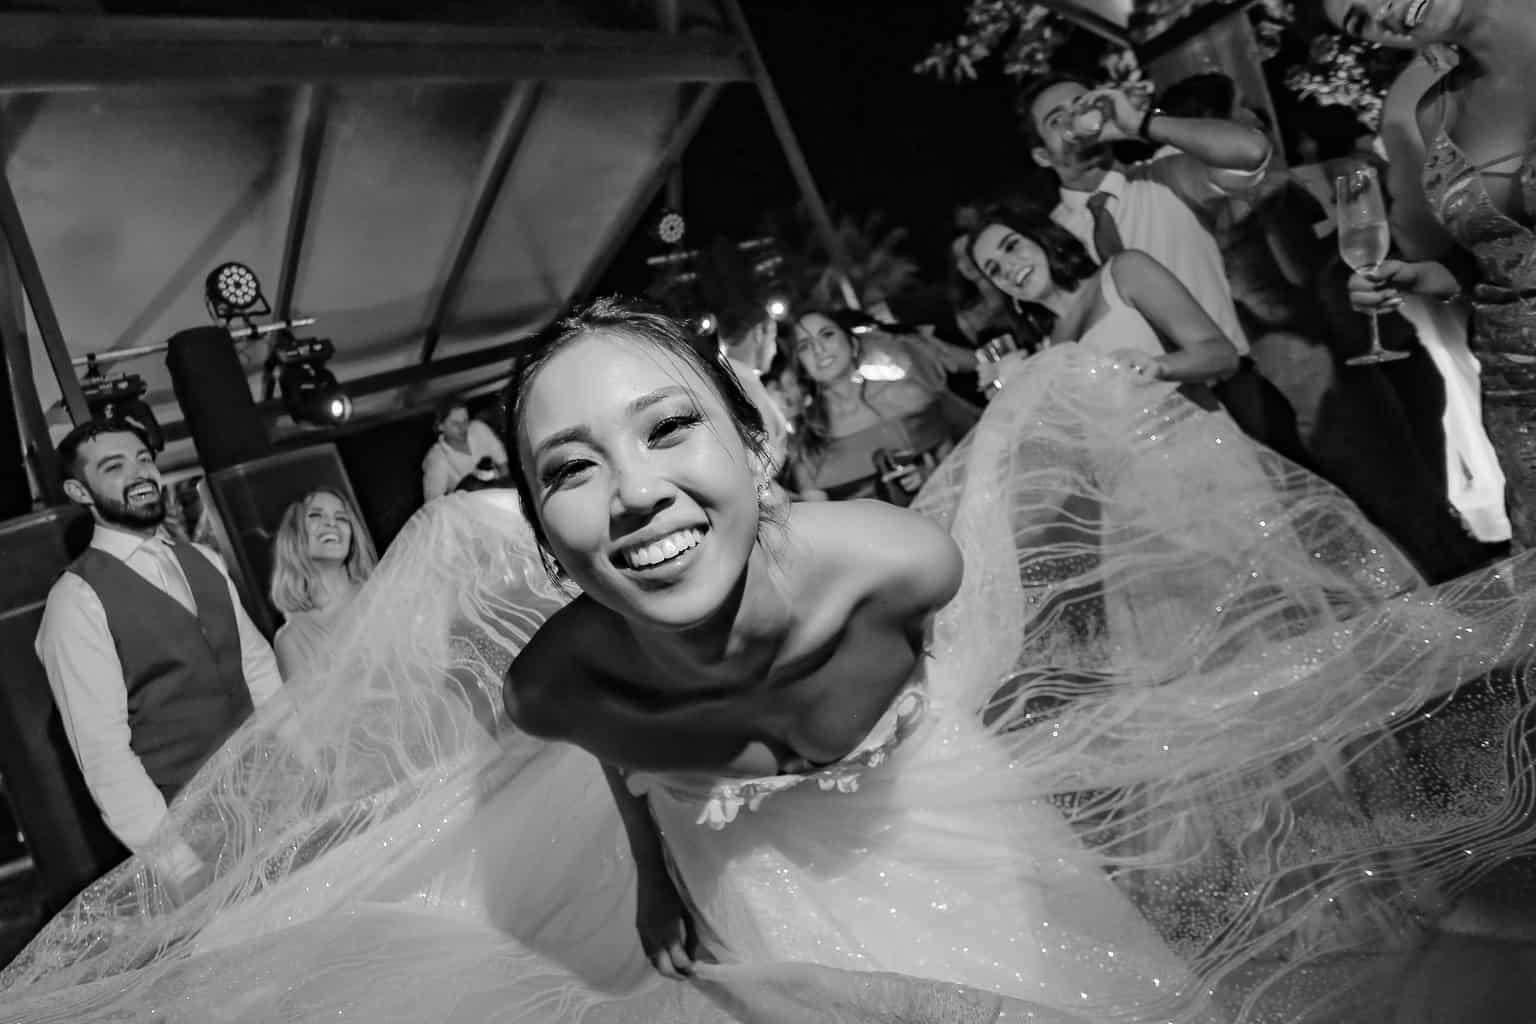 Casamento-Alissa-e-Gustavo-Cerimonial-Manu-Goncalez-Decor-Andrea-Kapps-Fasano-Angra-dos-Reis-Foto-VRebel-DJ-Jimmy-festa5918